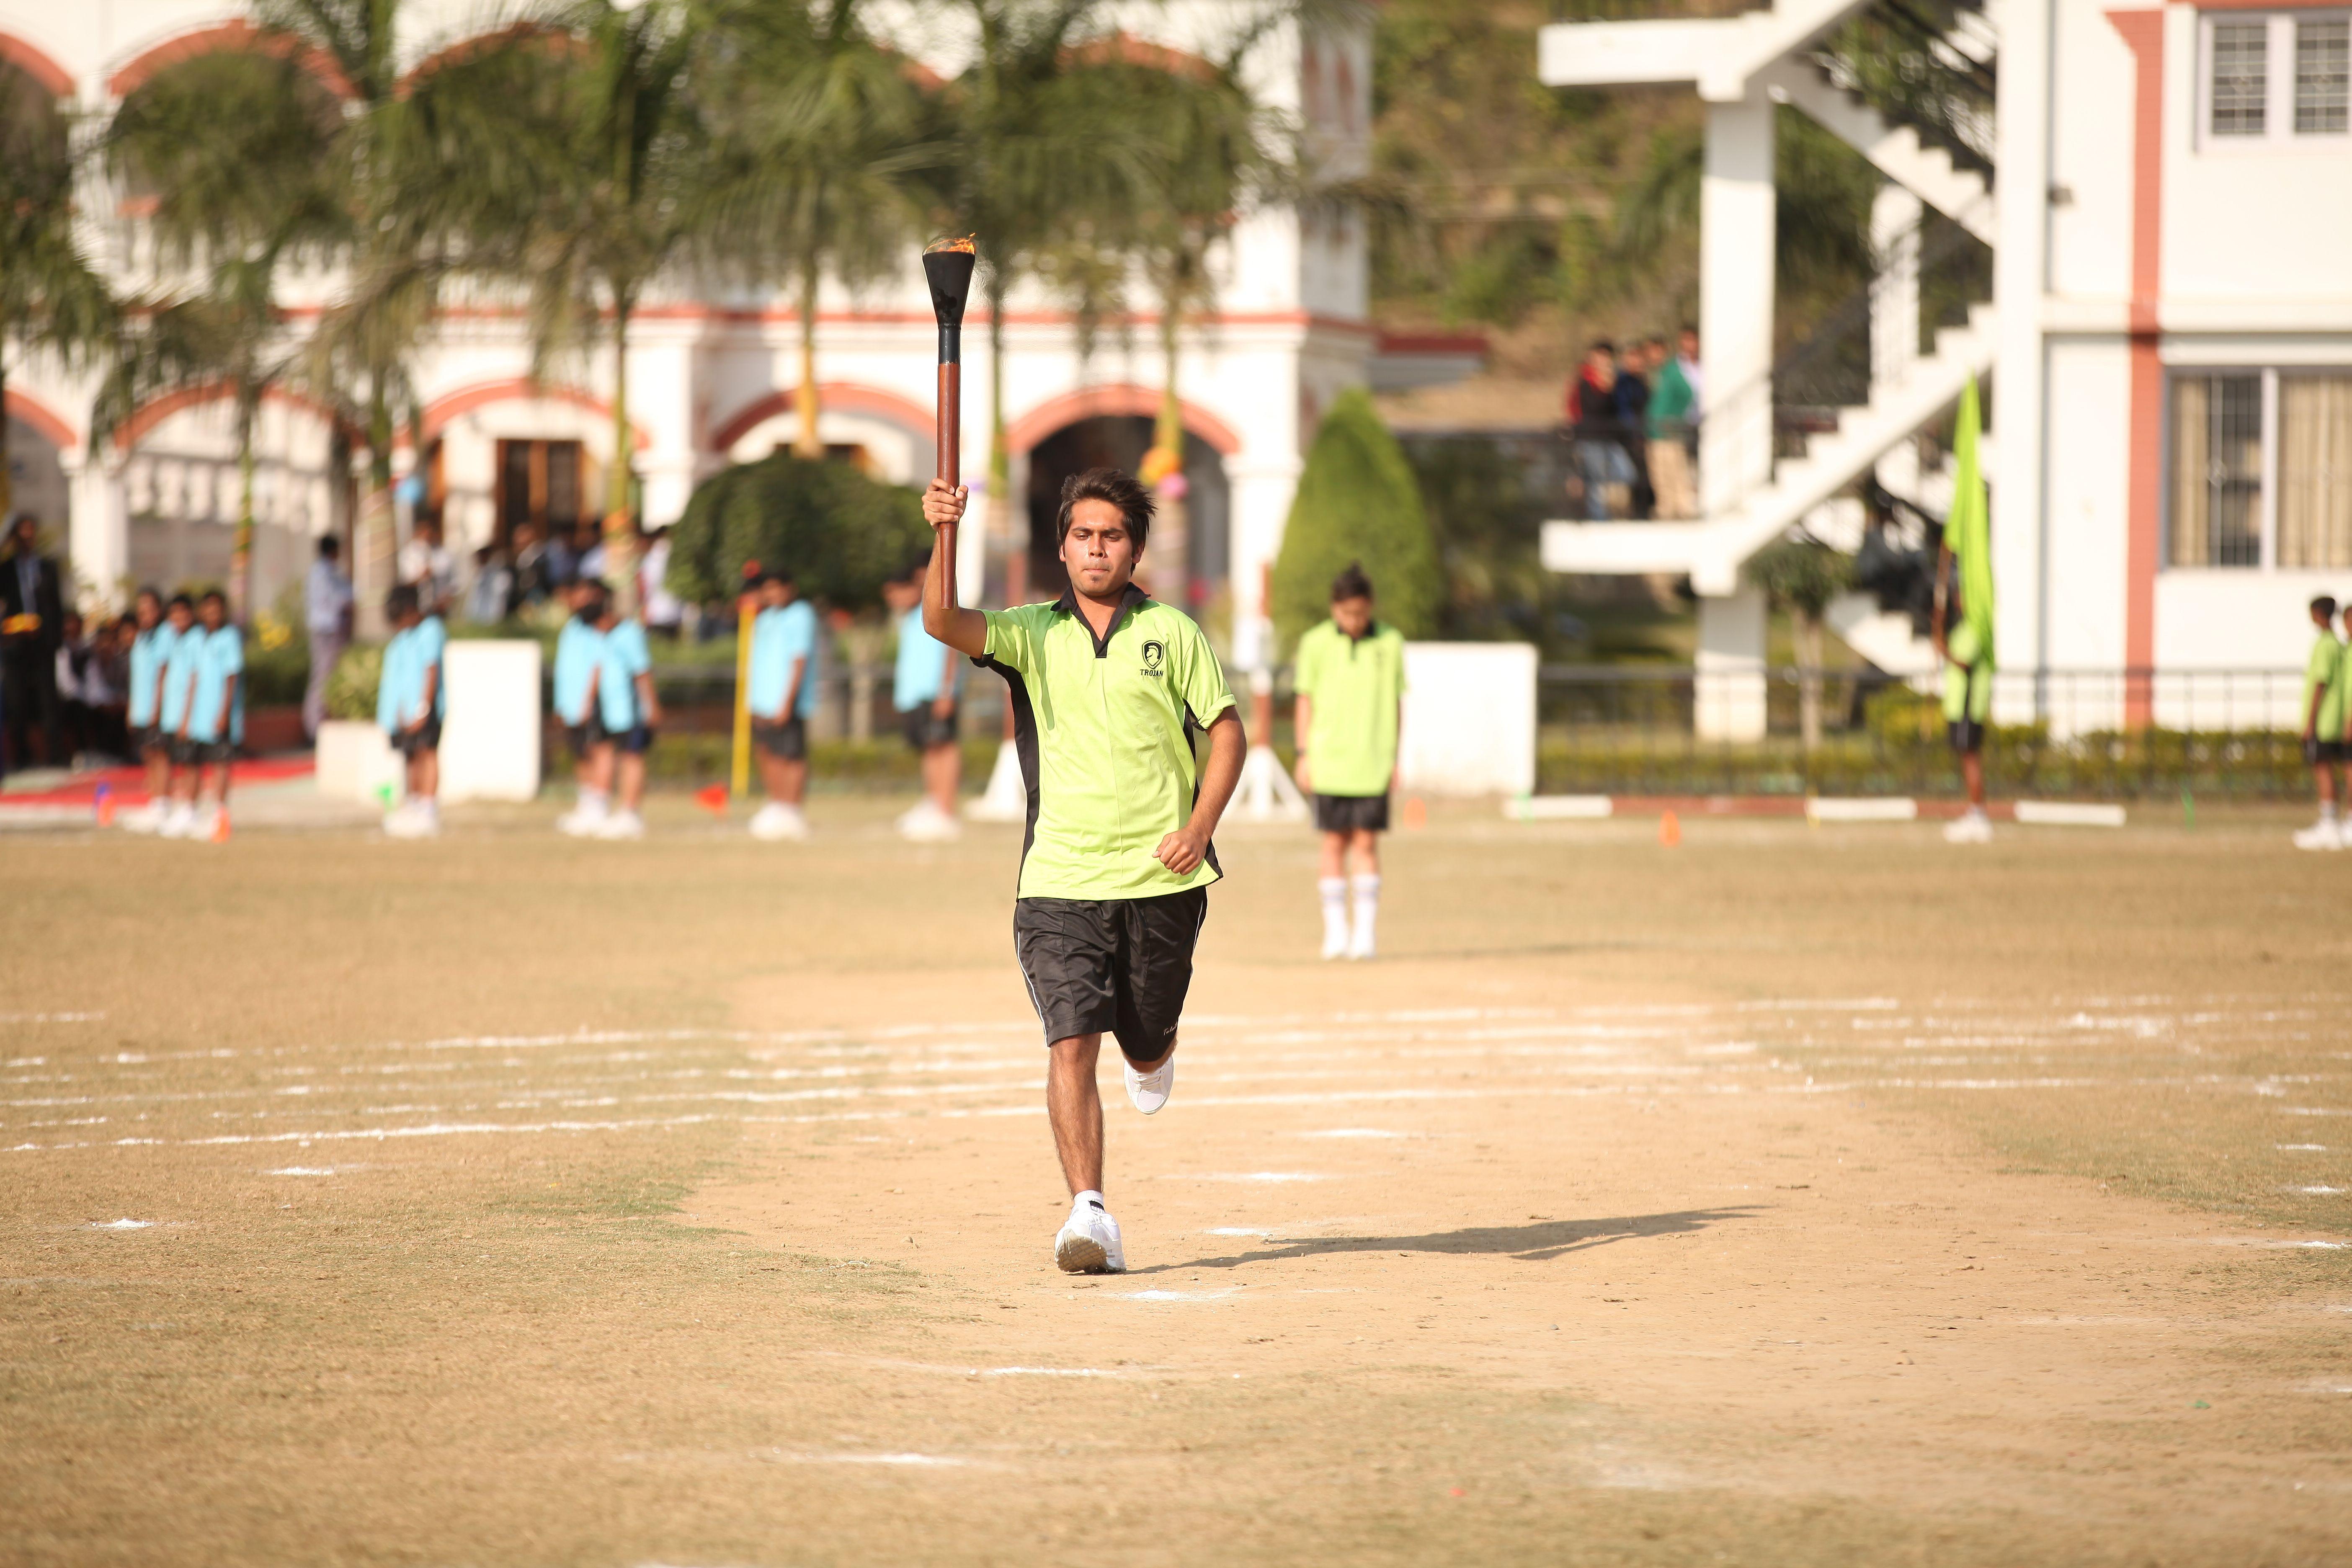 idrætsundervisning